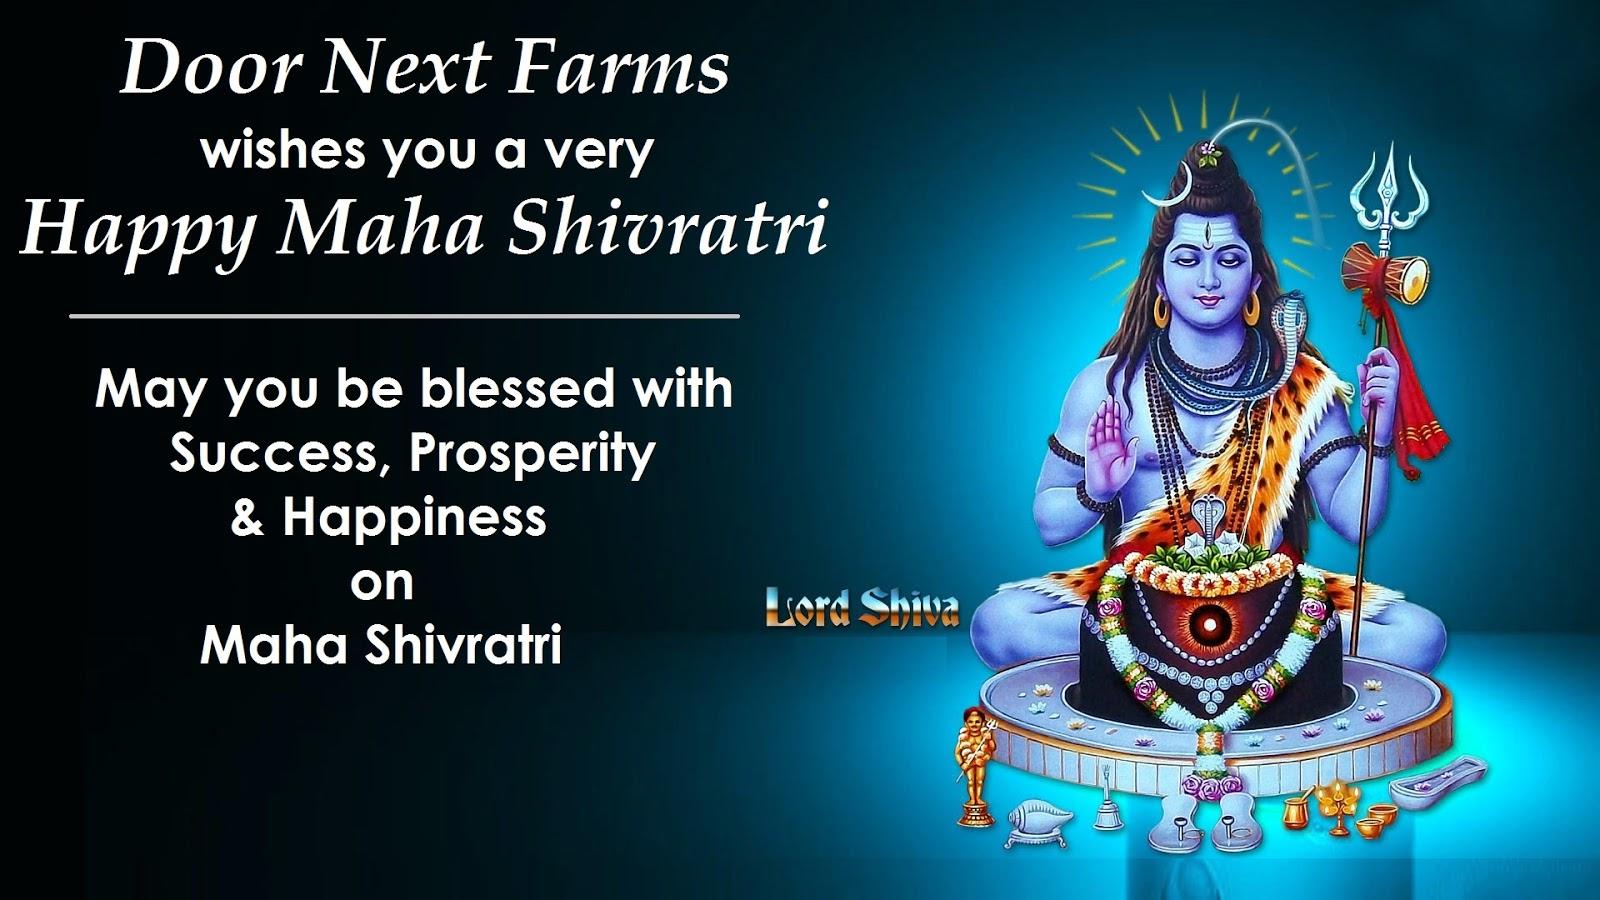 Maha Shivratri Pictures